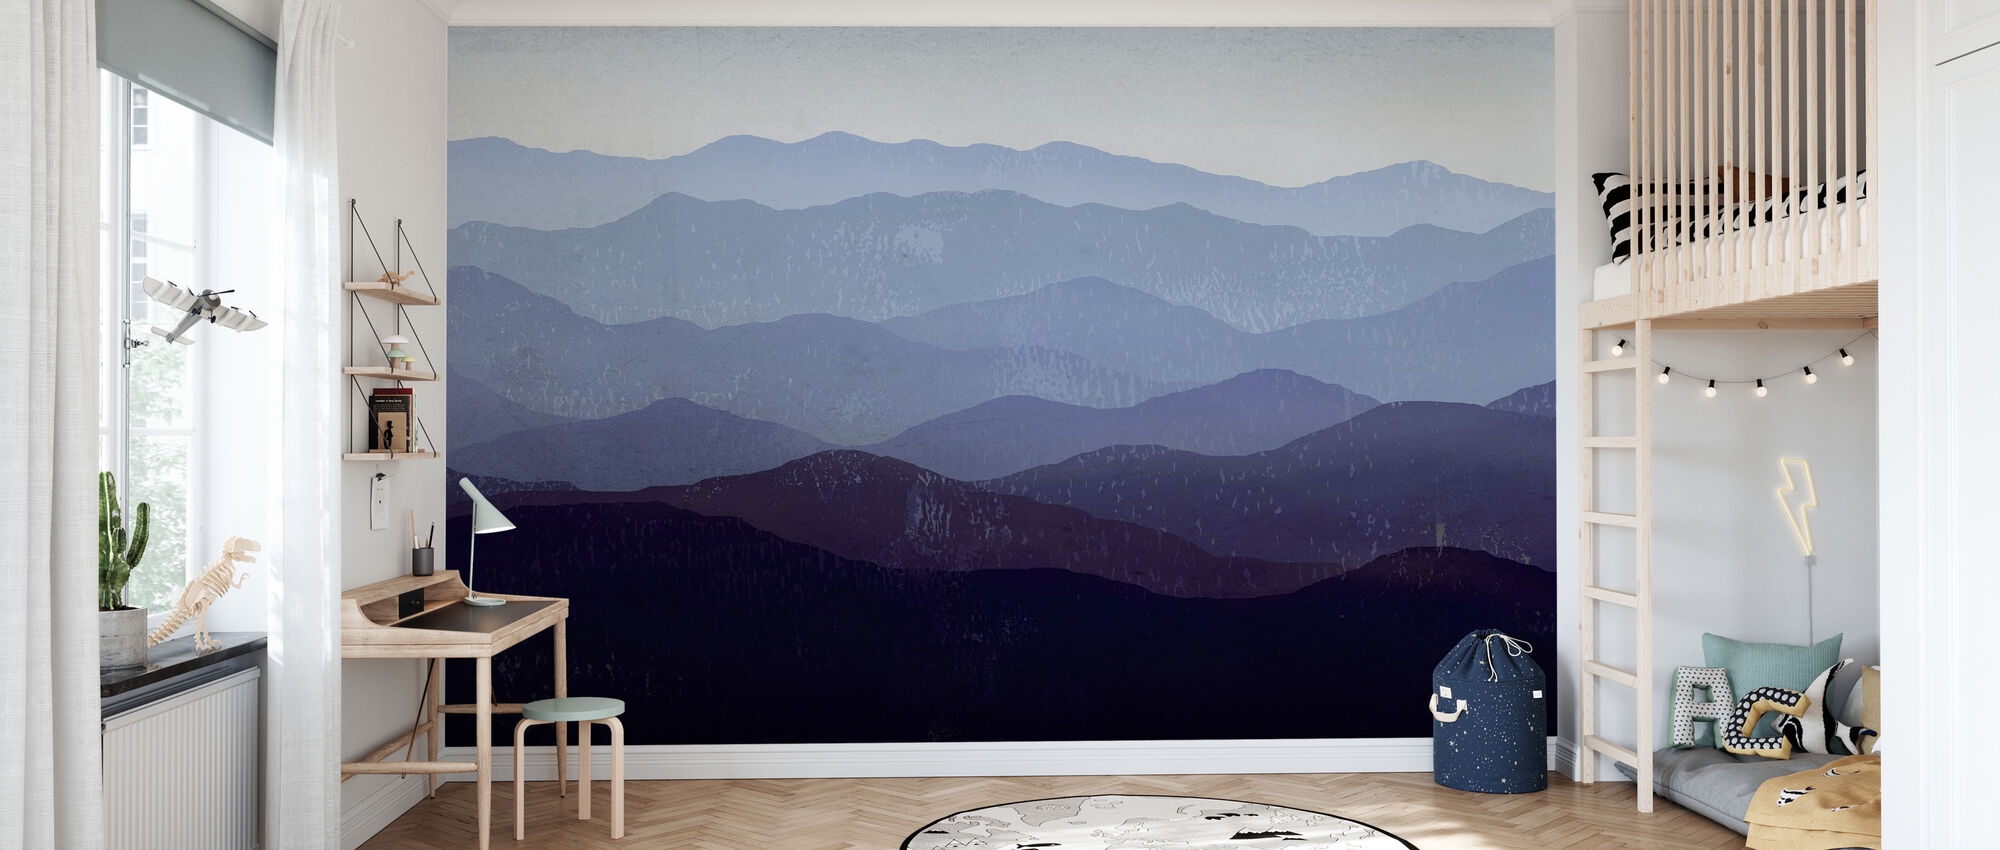 Ryan Fowler - Purple Mountains - Wallpaper - Kids Room